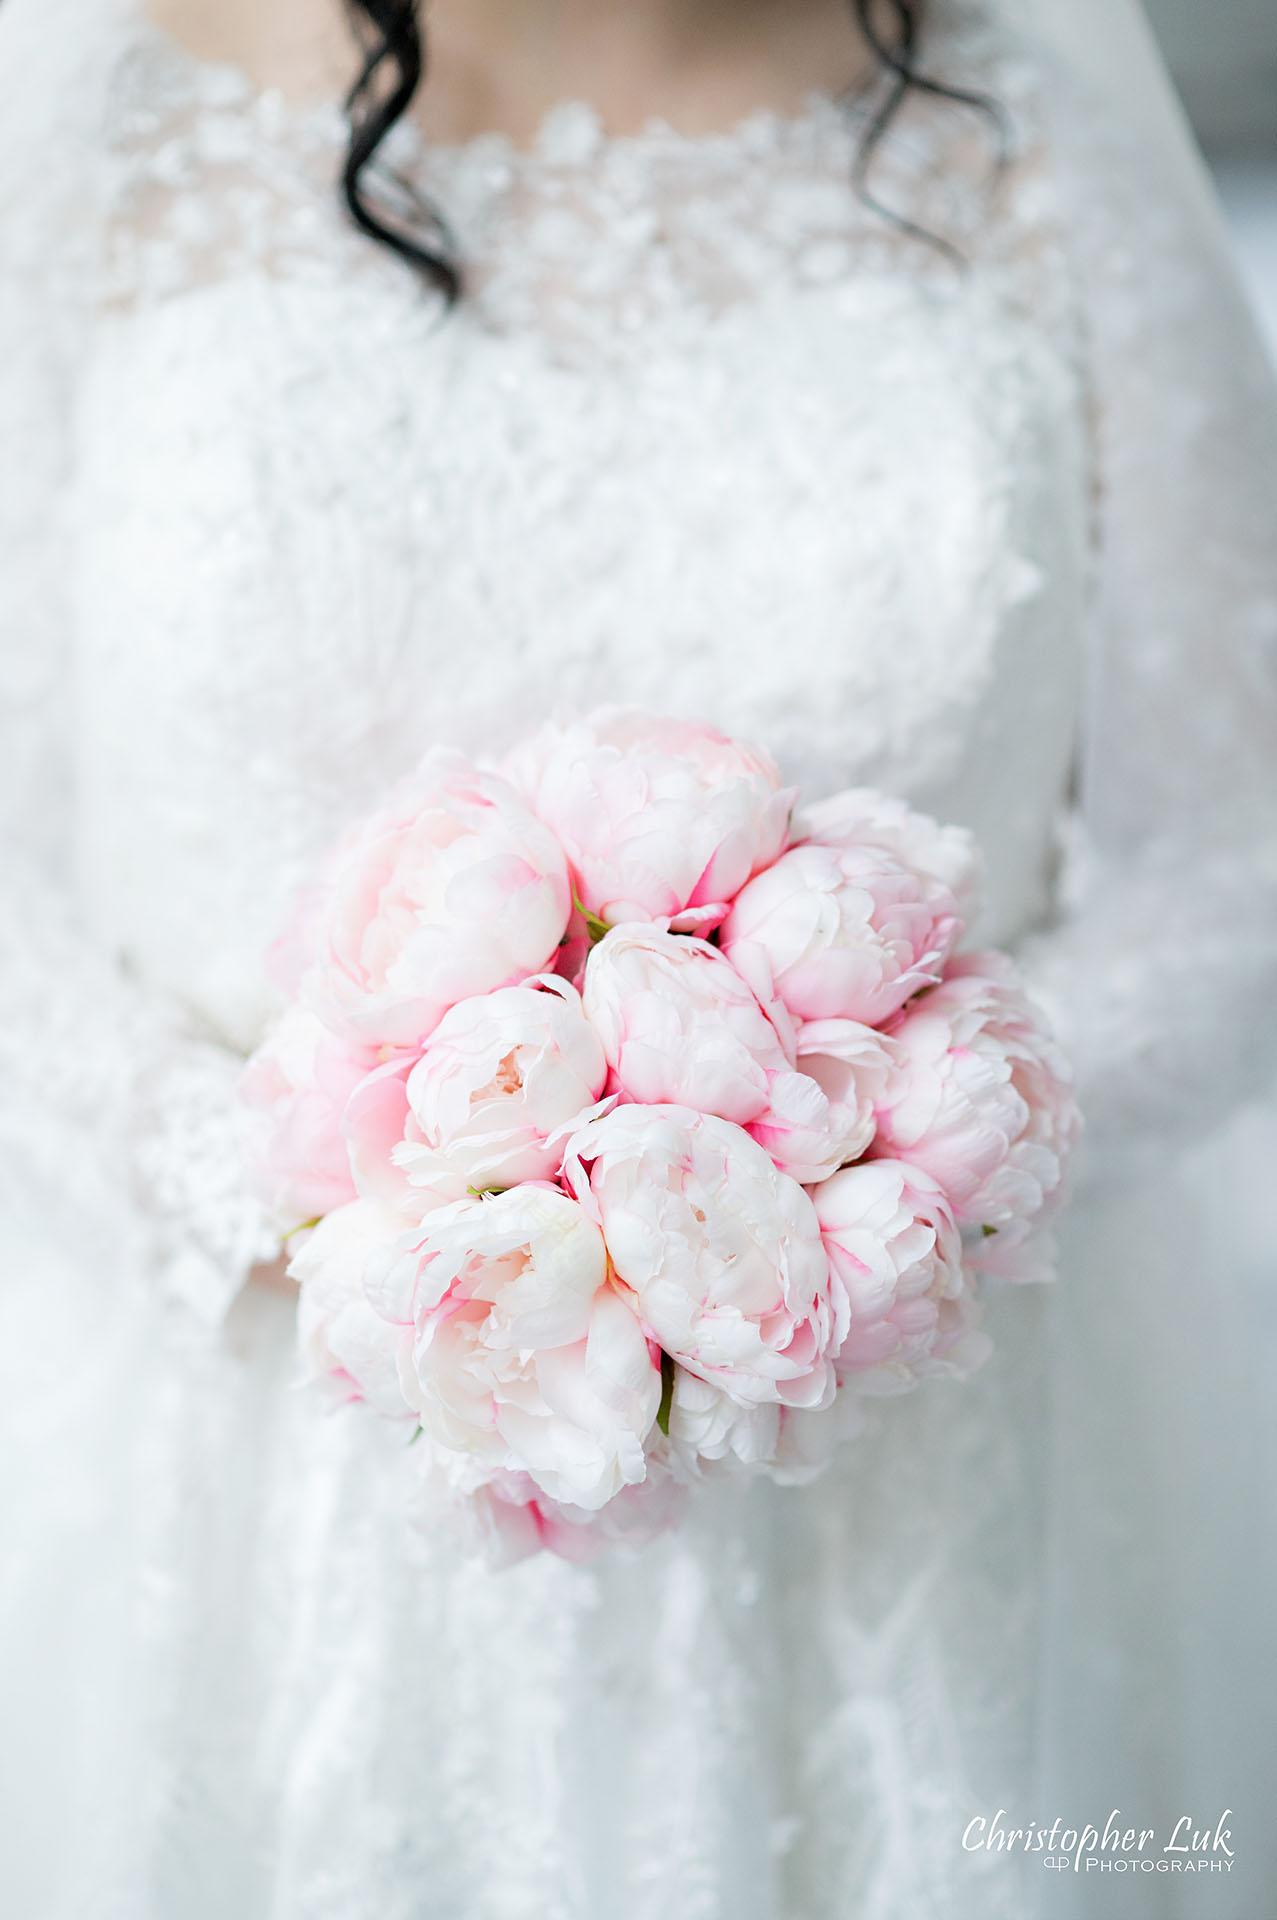 King Edward Hotel Crystal Ballroom Toronto Wedding Photographer MicroWedding Peonies Bride Flowers Bouquet Detail